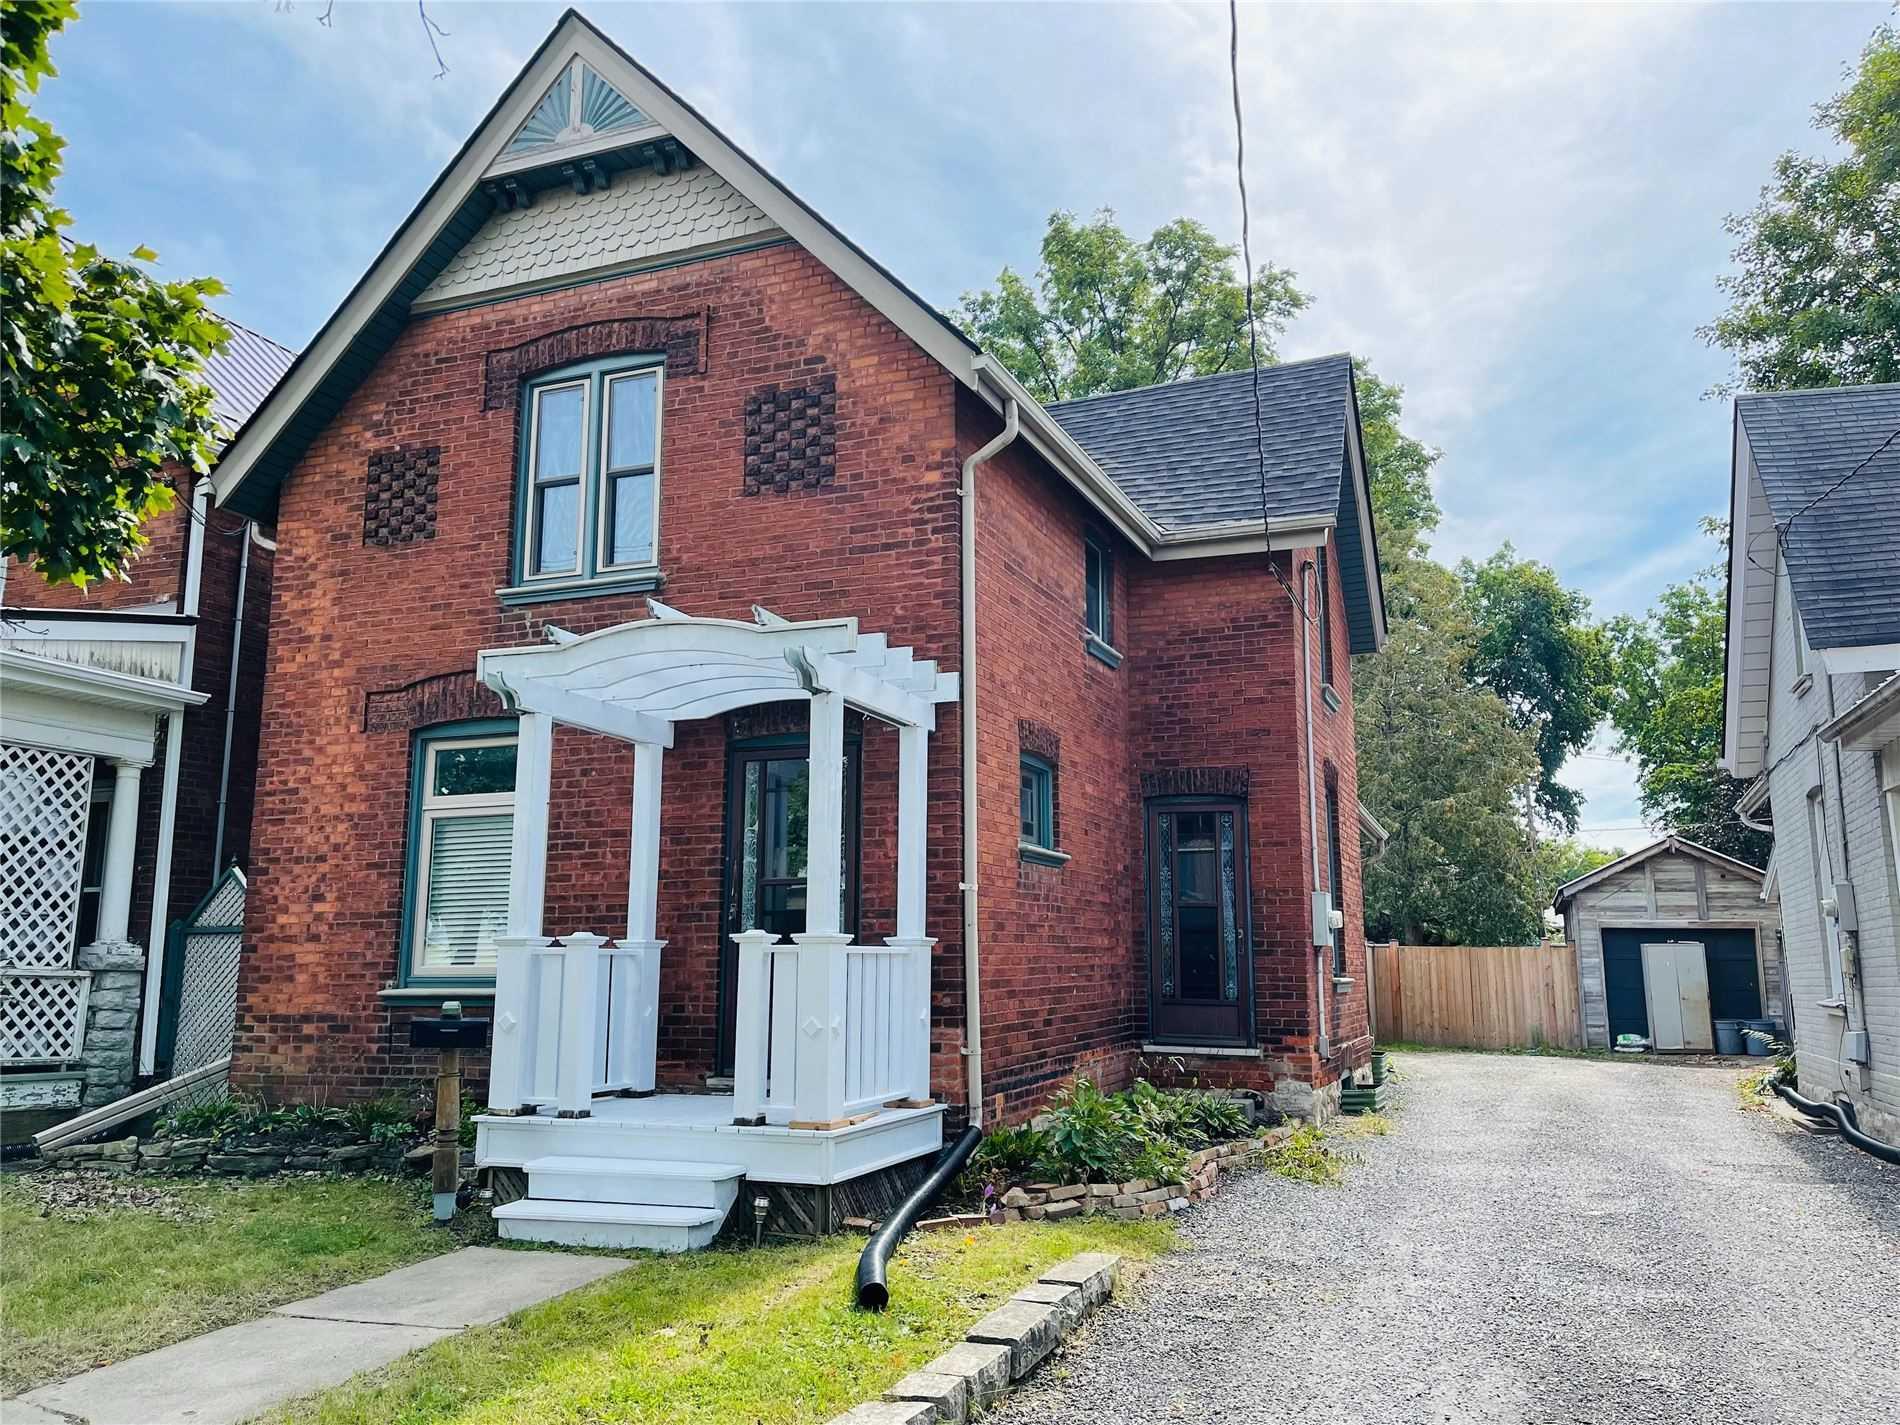 Detached house For Lease In Brantford - 19 Port St, Brantford, Ontario, Canada N3S1X9 , 4 Bedrooms Bedrooms, ,2 BathroomsBathrooms,Detached,For Lease,Port